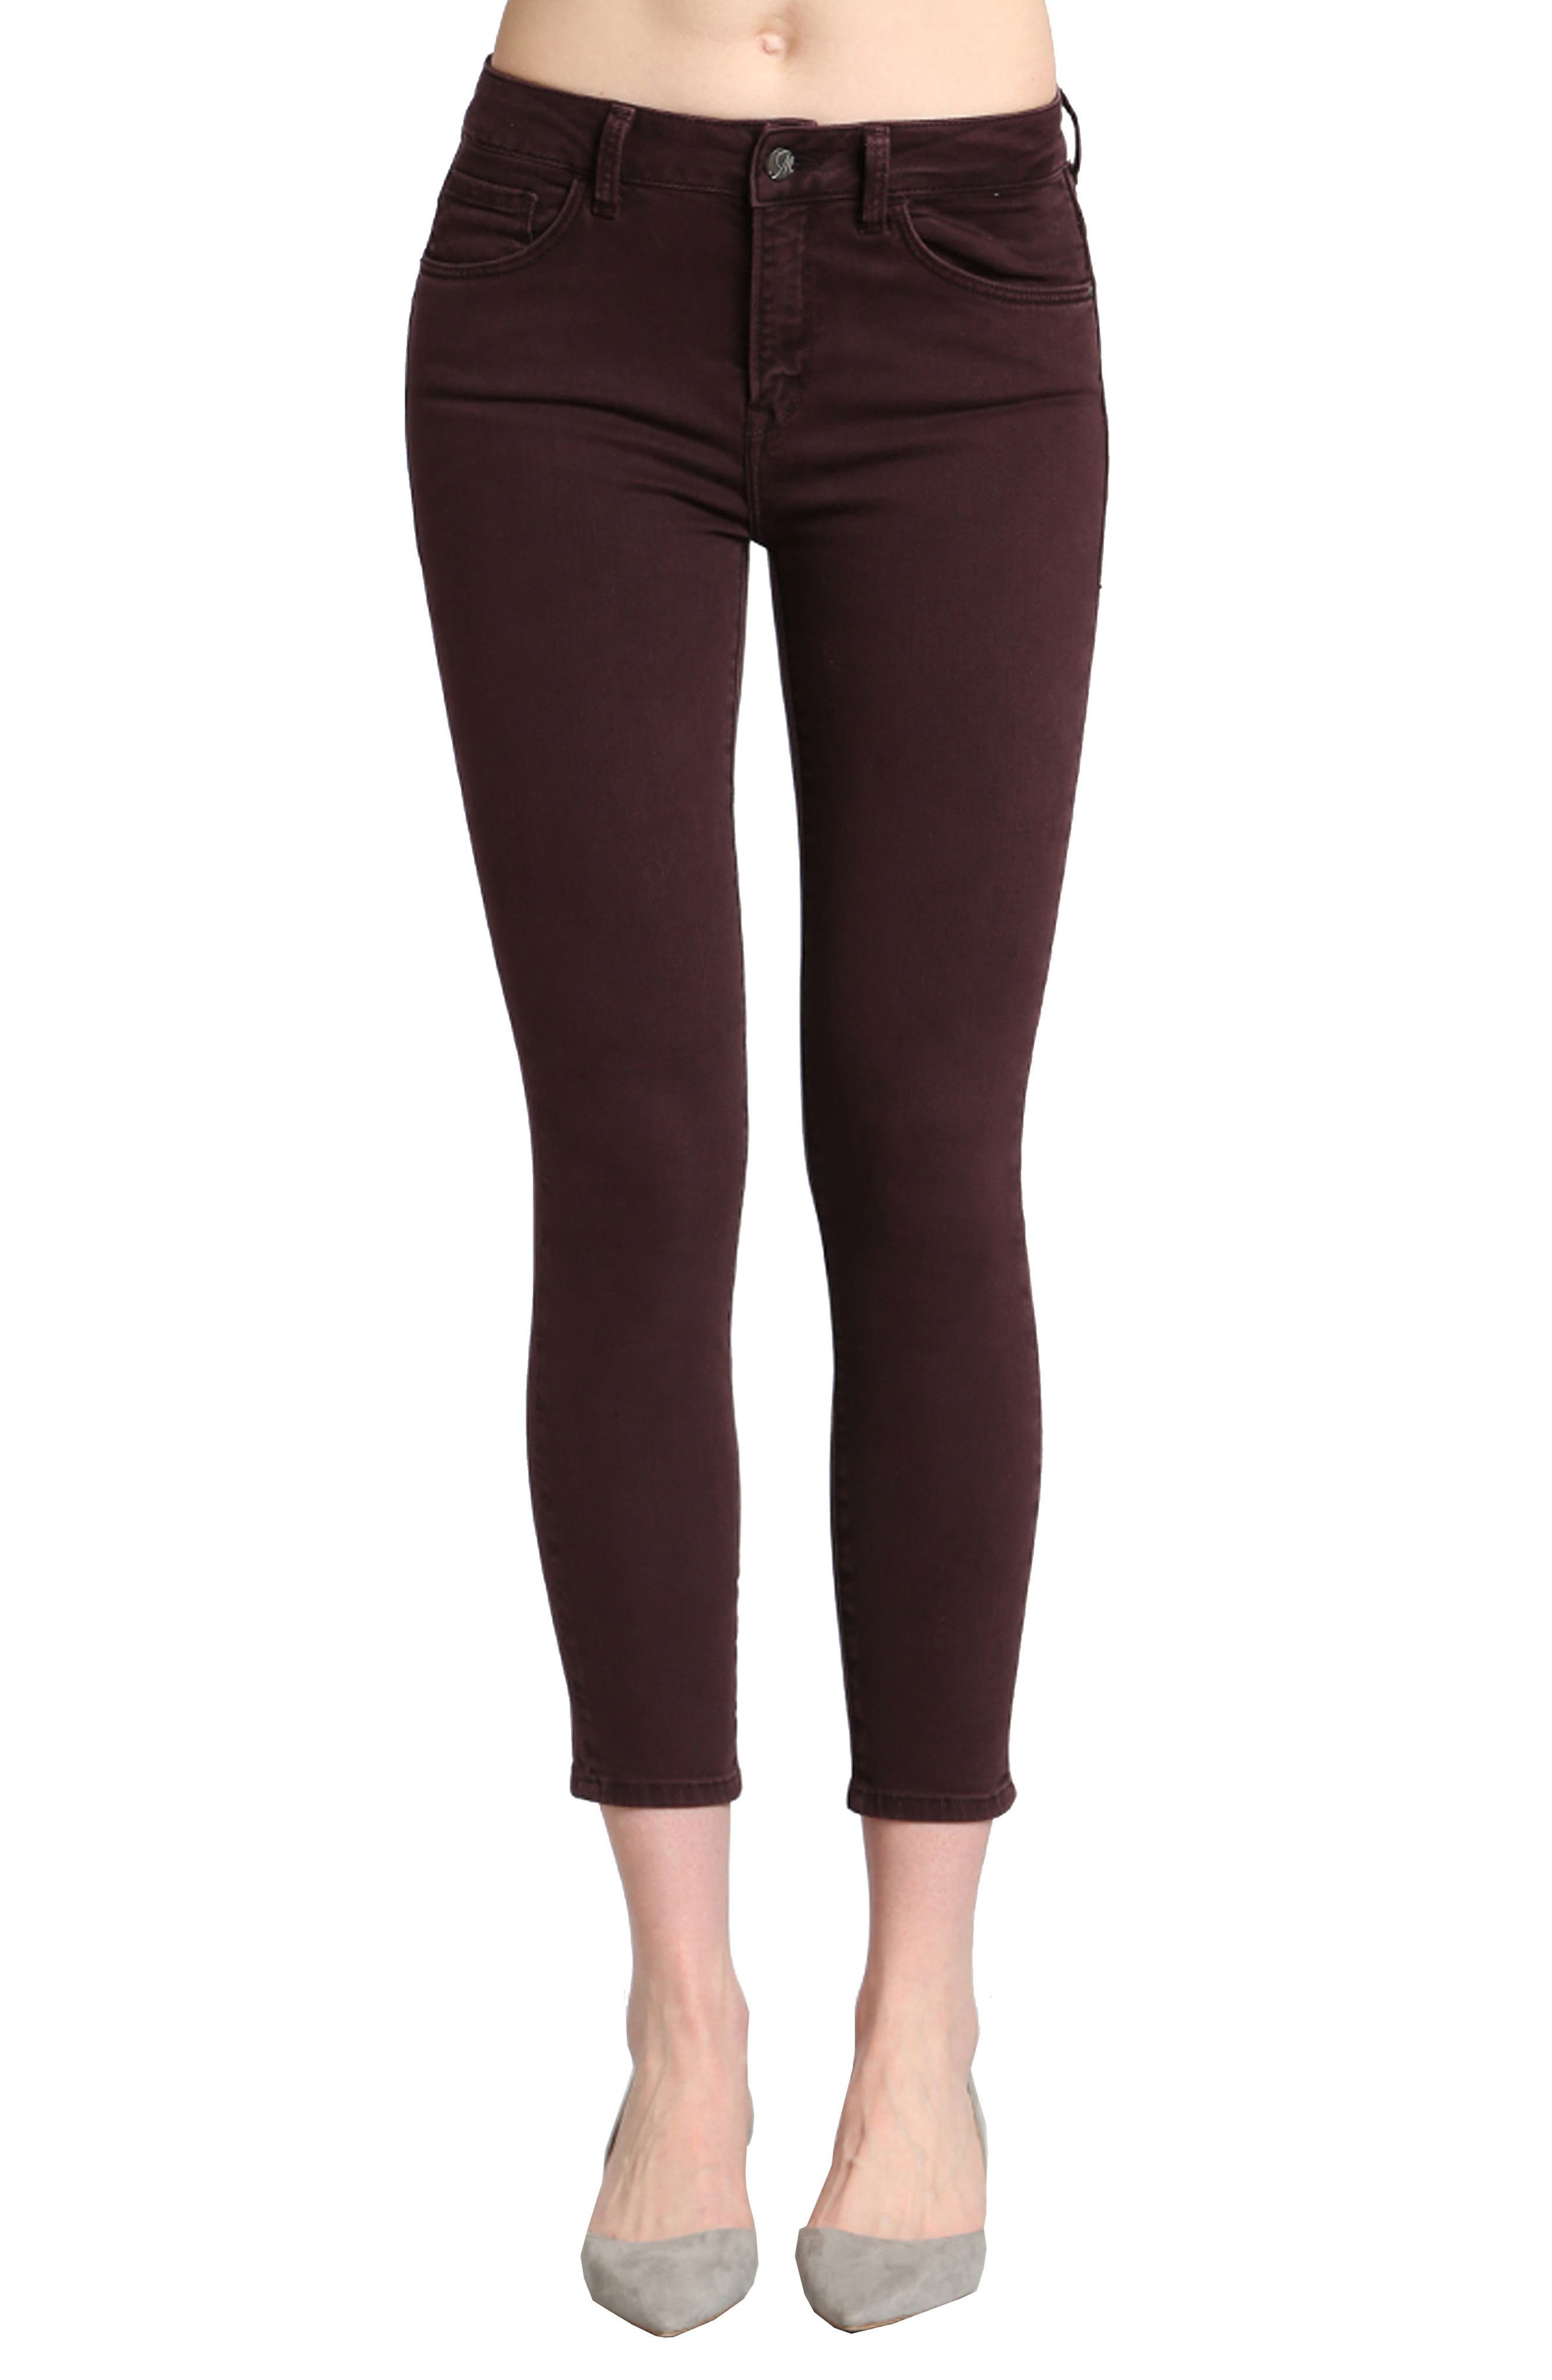 Alternate Image 1 Selected - Mavi Jeans Tess Skinny Jeans (Wine)